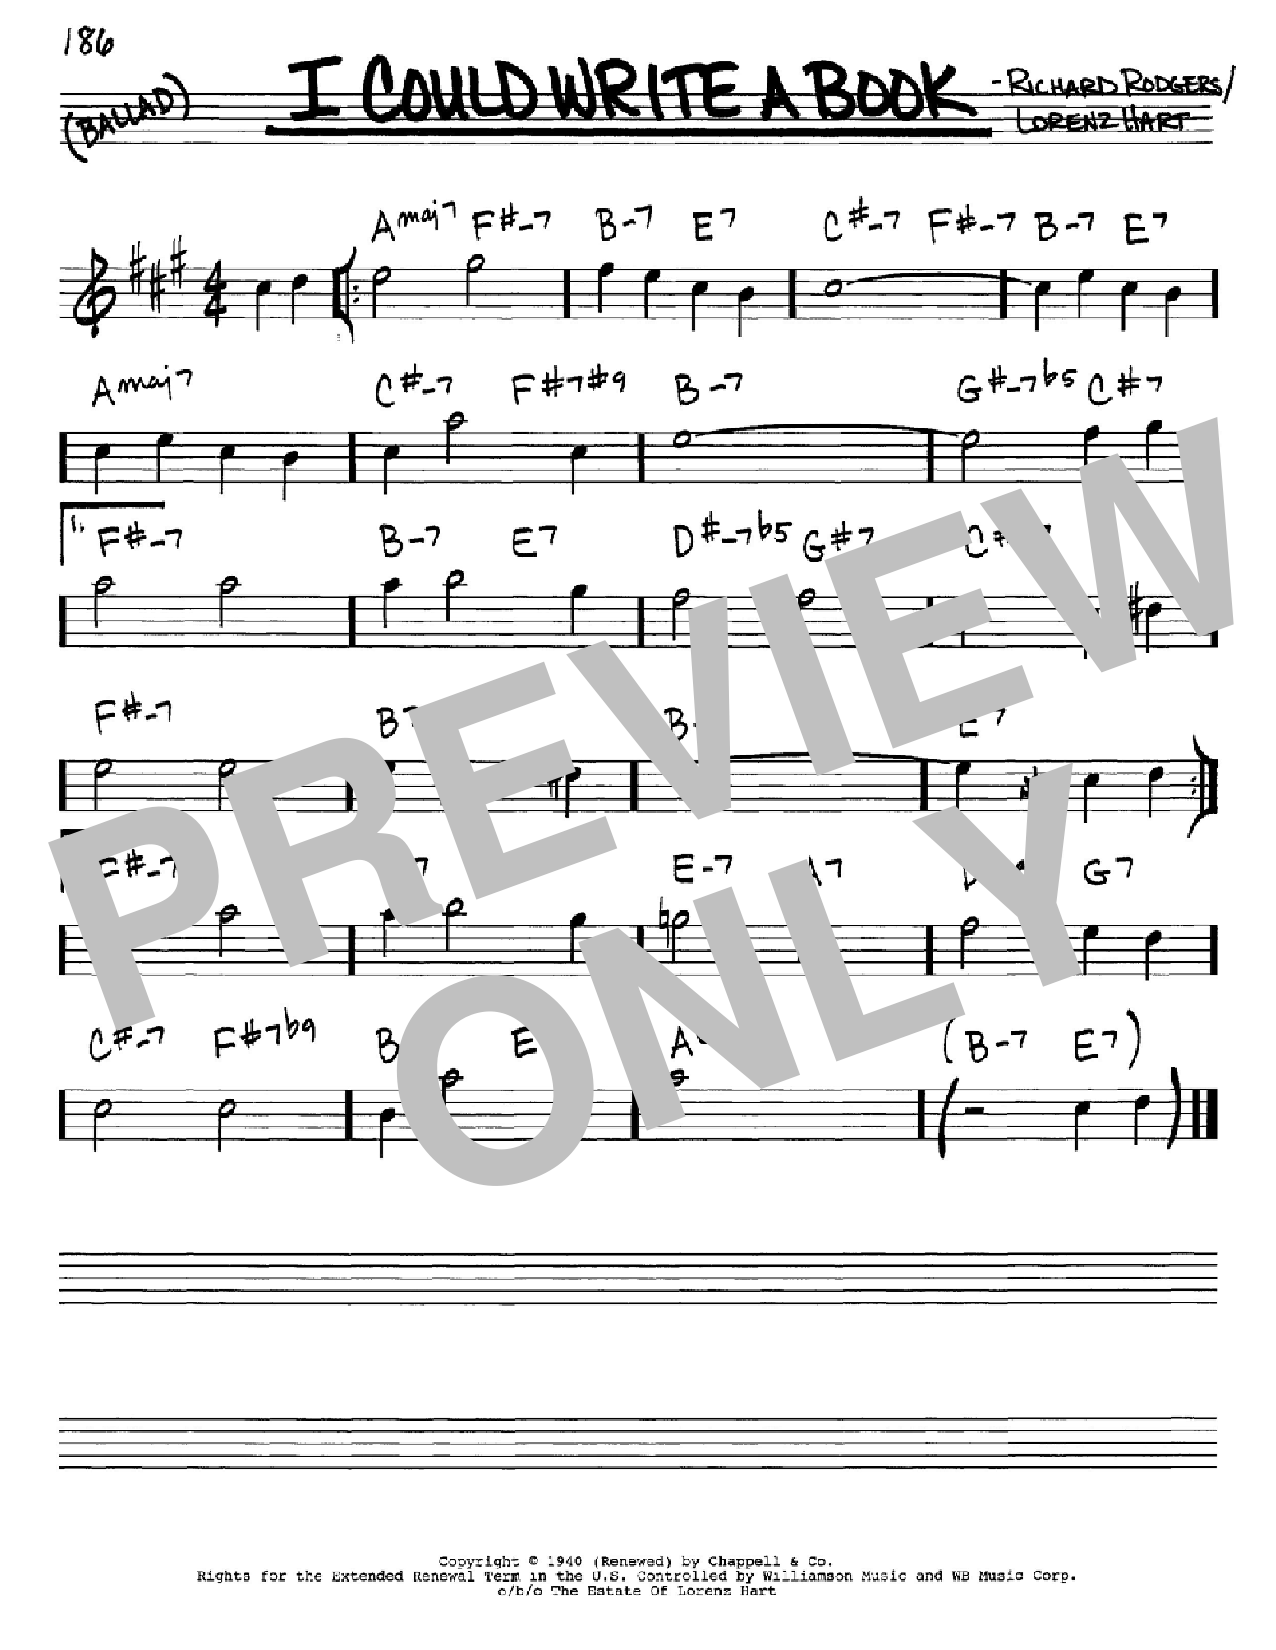 Partition autre I Could Write A Book de Rodgers & Hart - Real Book, Melodie et Accords, Inst. En Mib